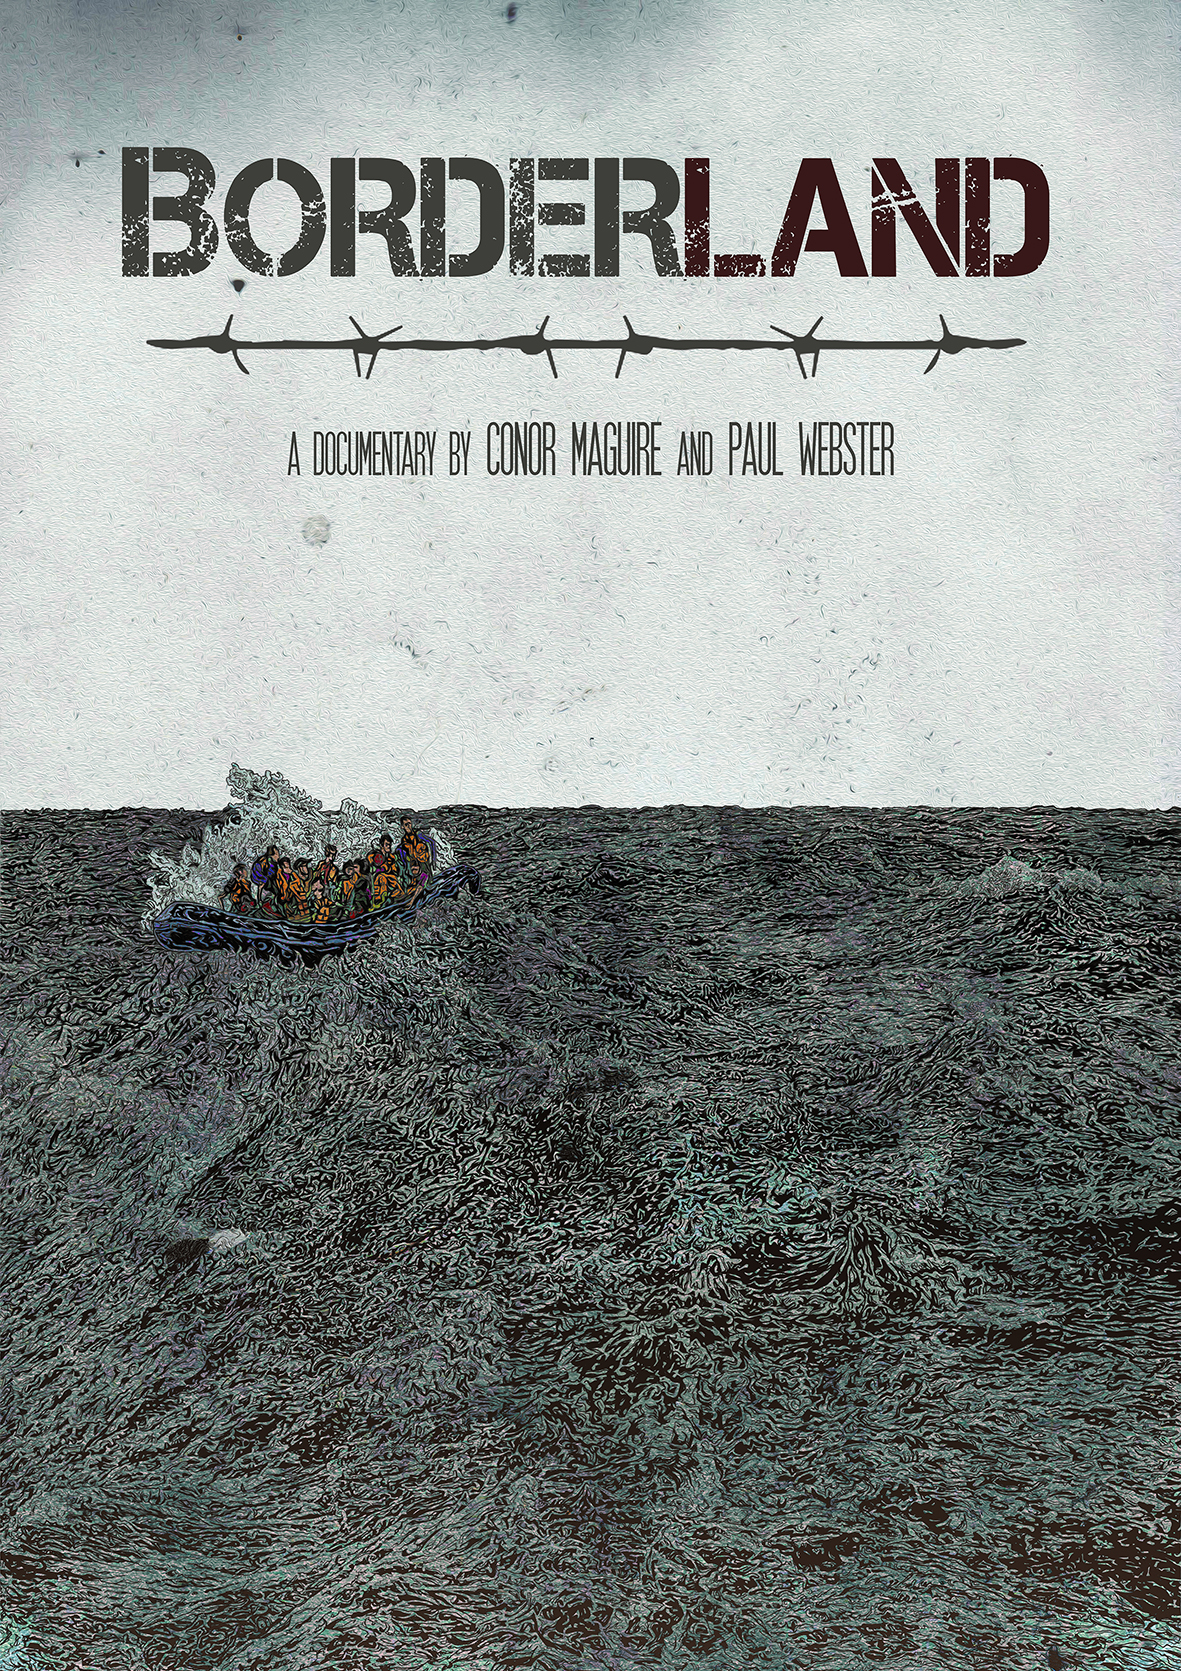 borderland-poster-online-version-1